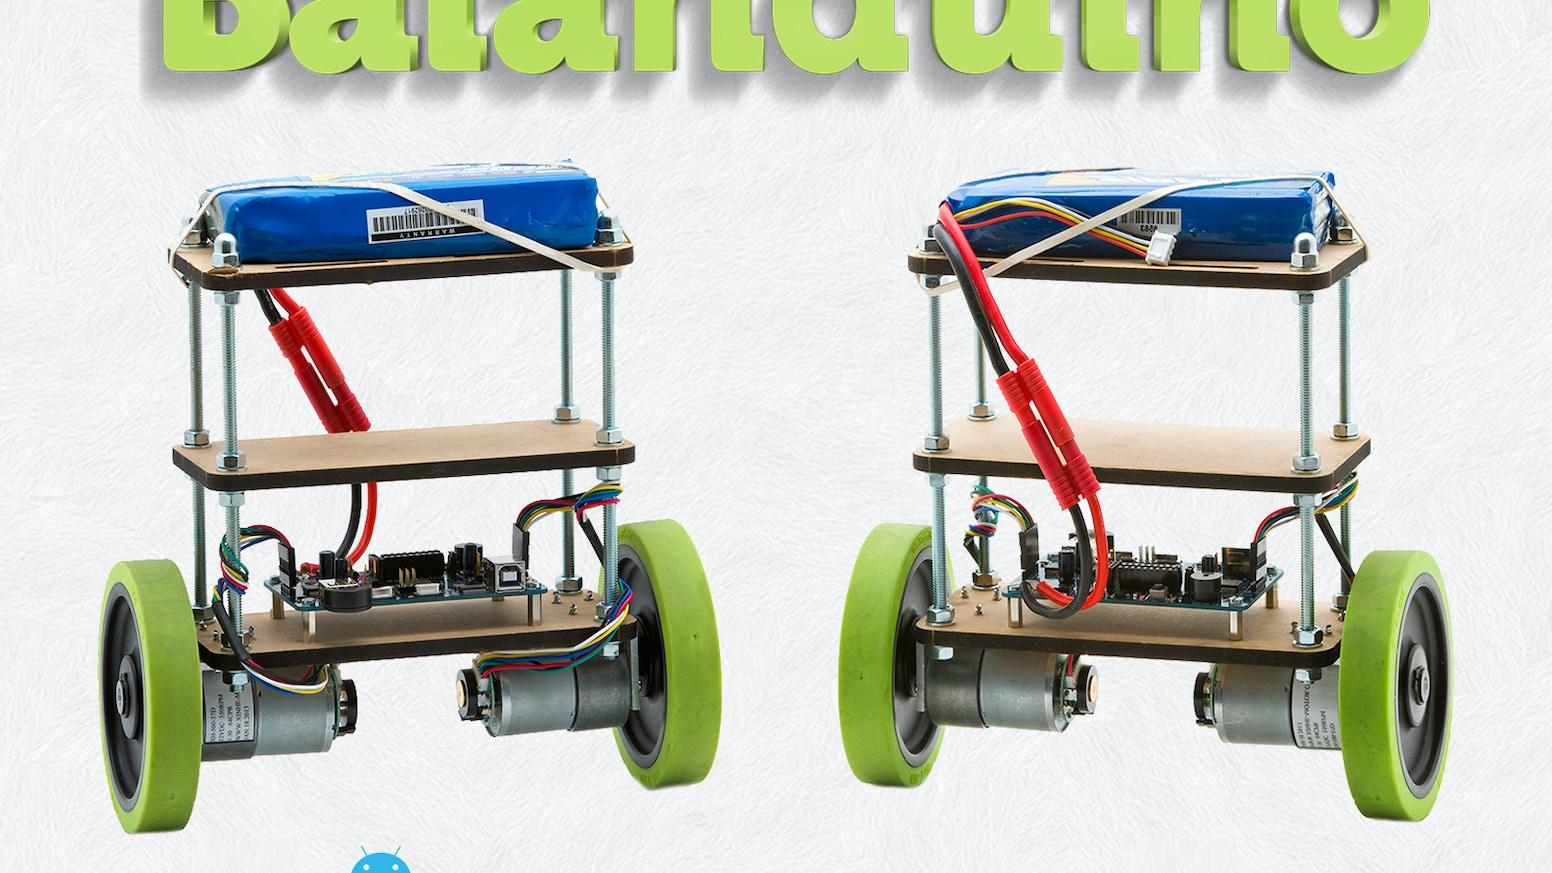 Balanduino - Balancing Robot Kit by TKJ Electronics